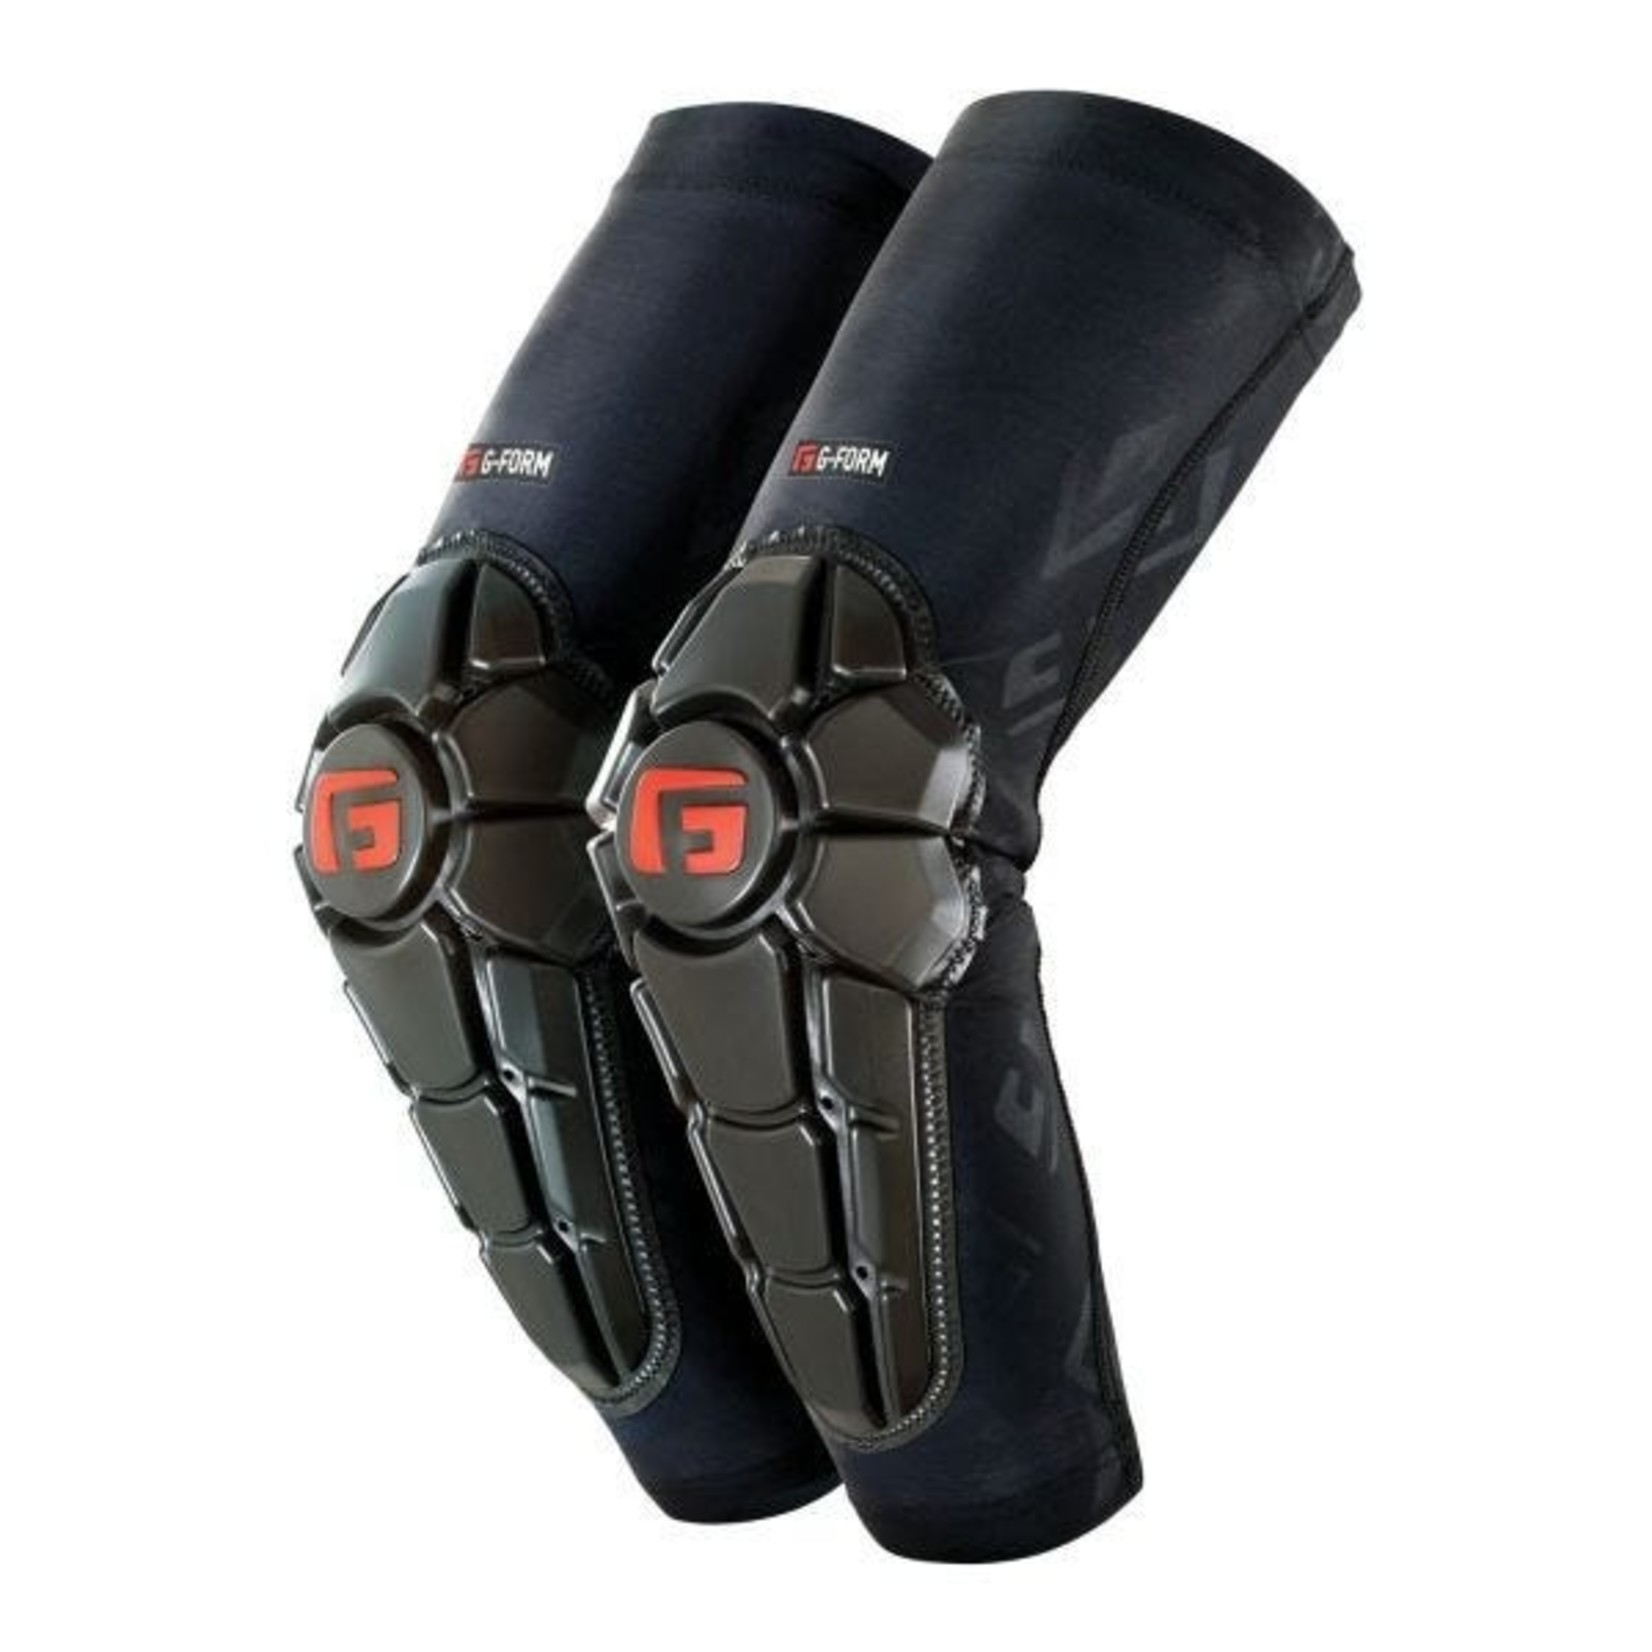 G-Form G-Form Pro-X2 Elbow Pads Black